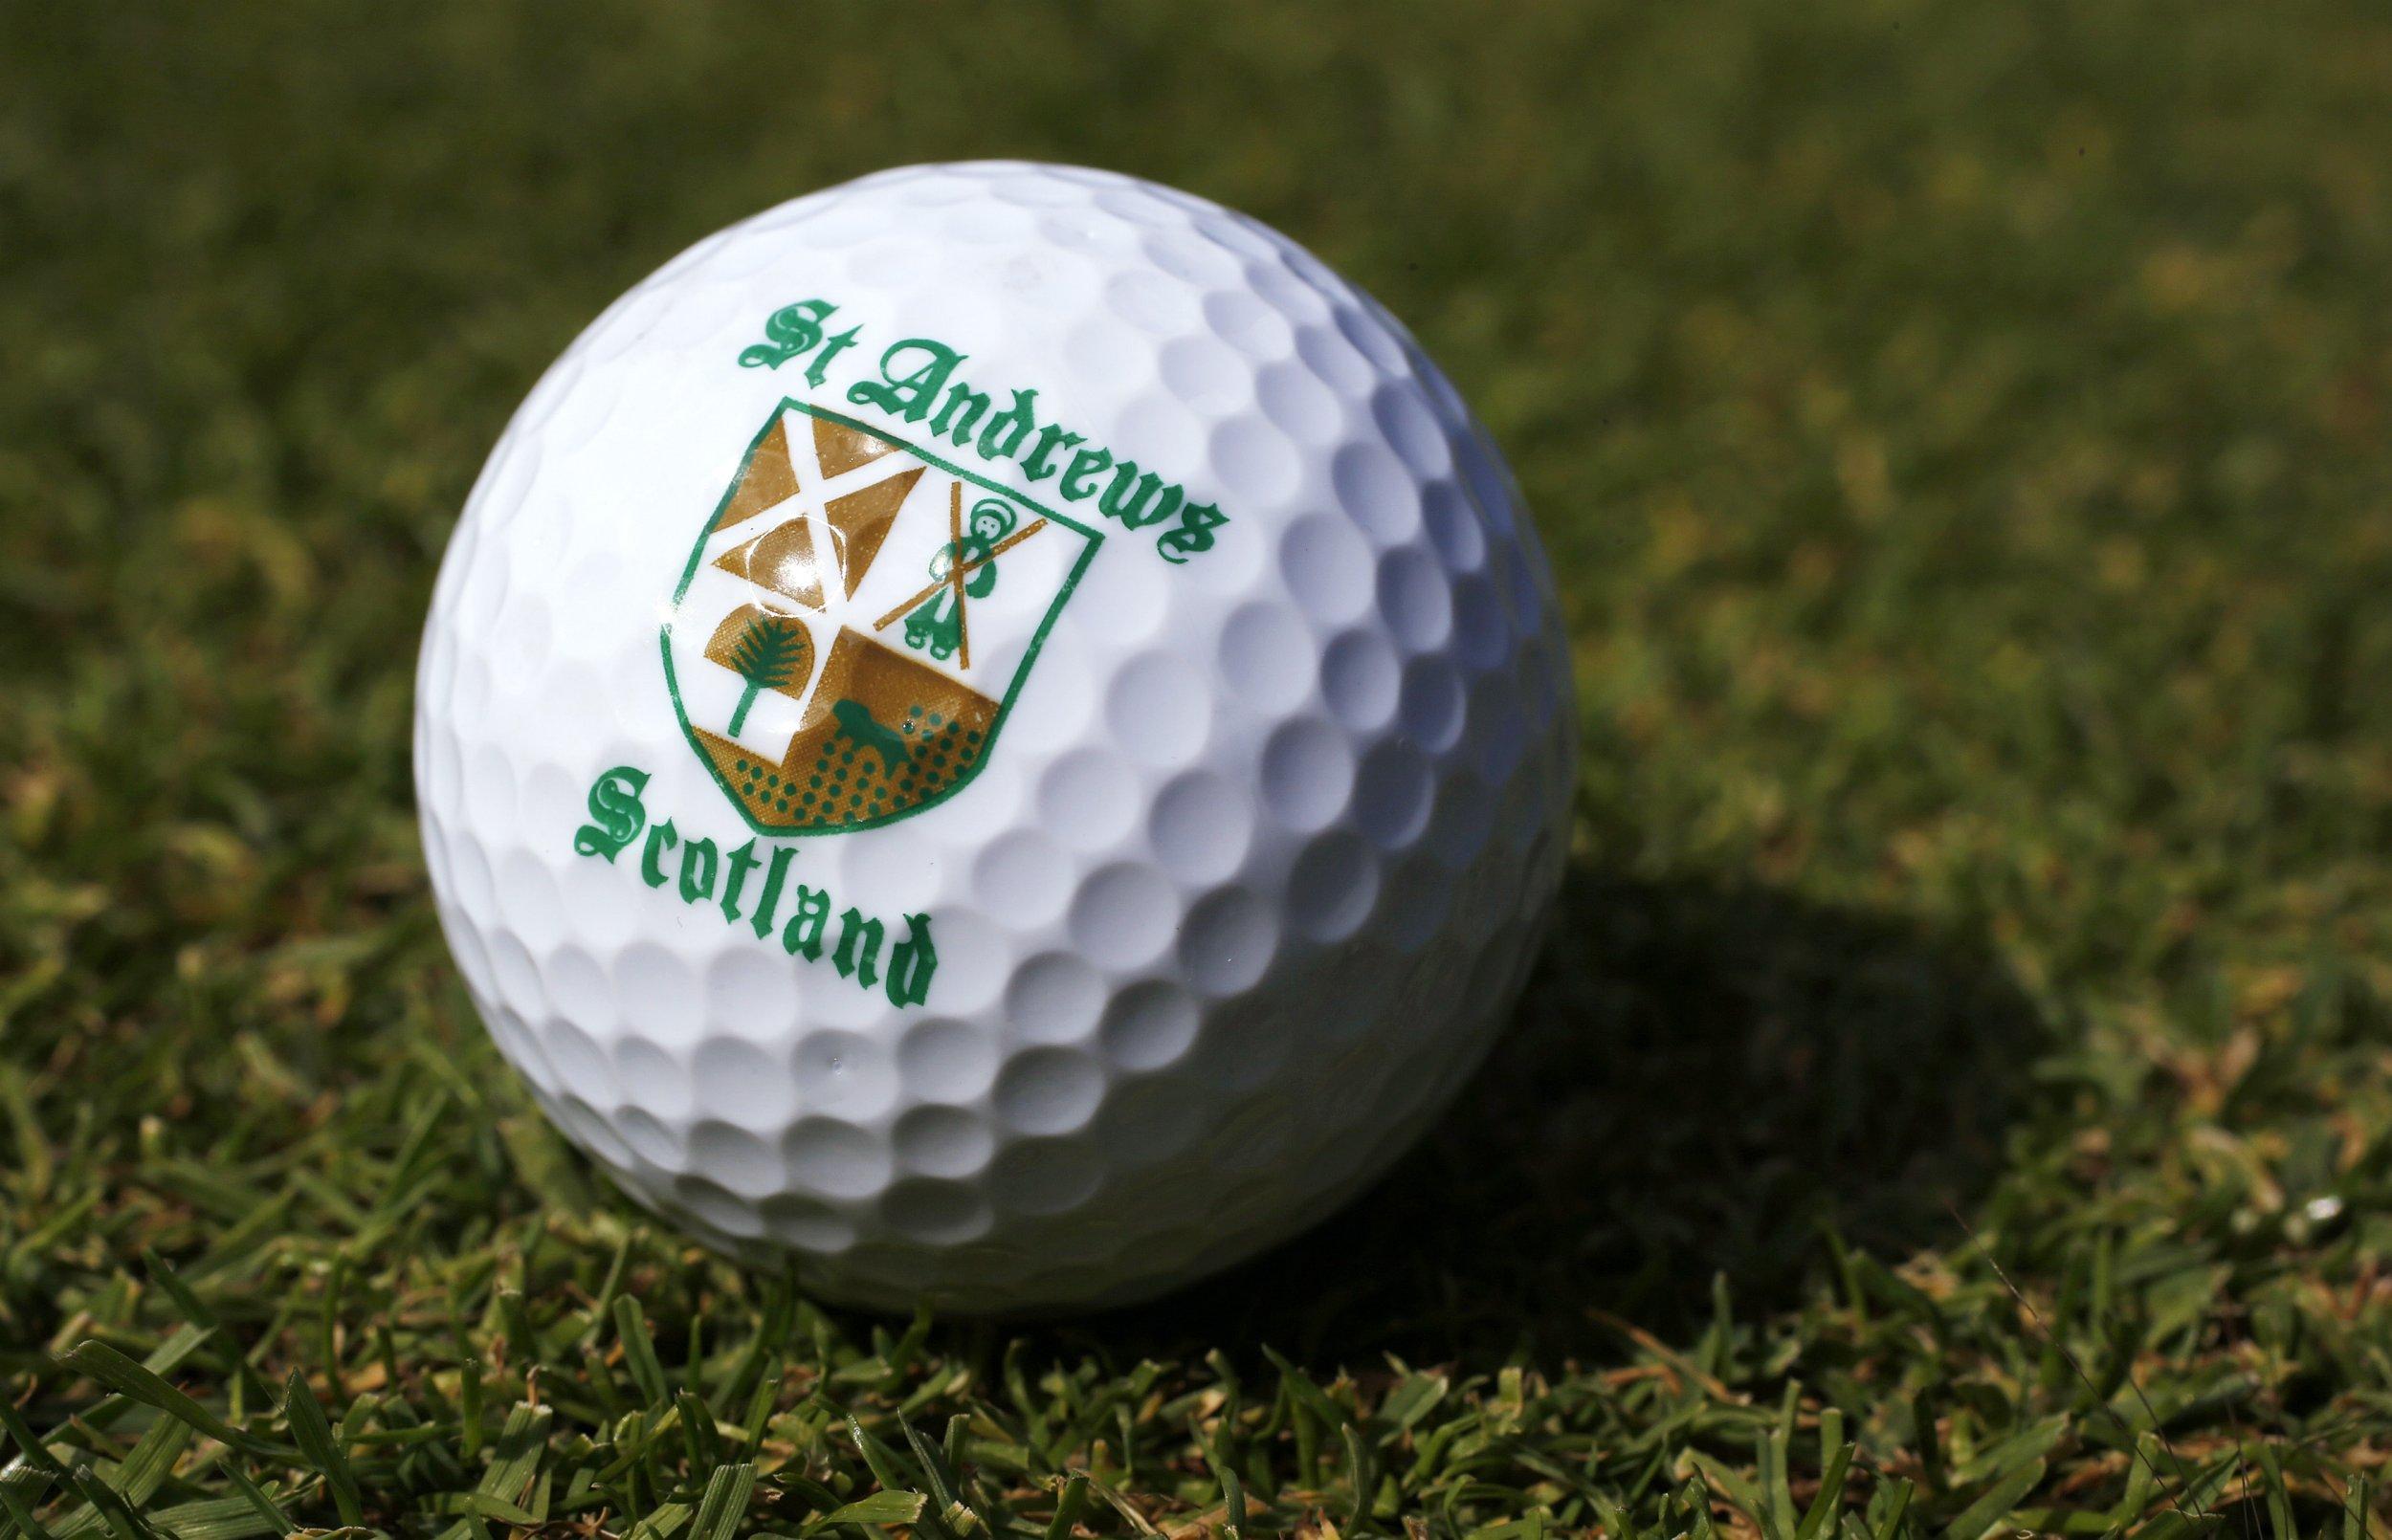 9-18-14 Golf